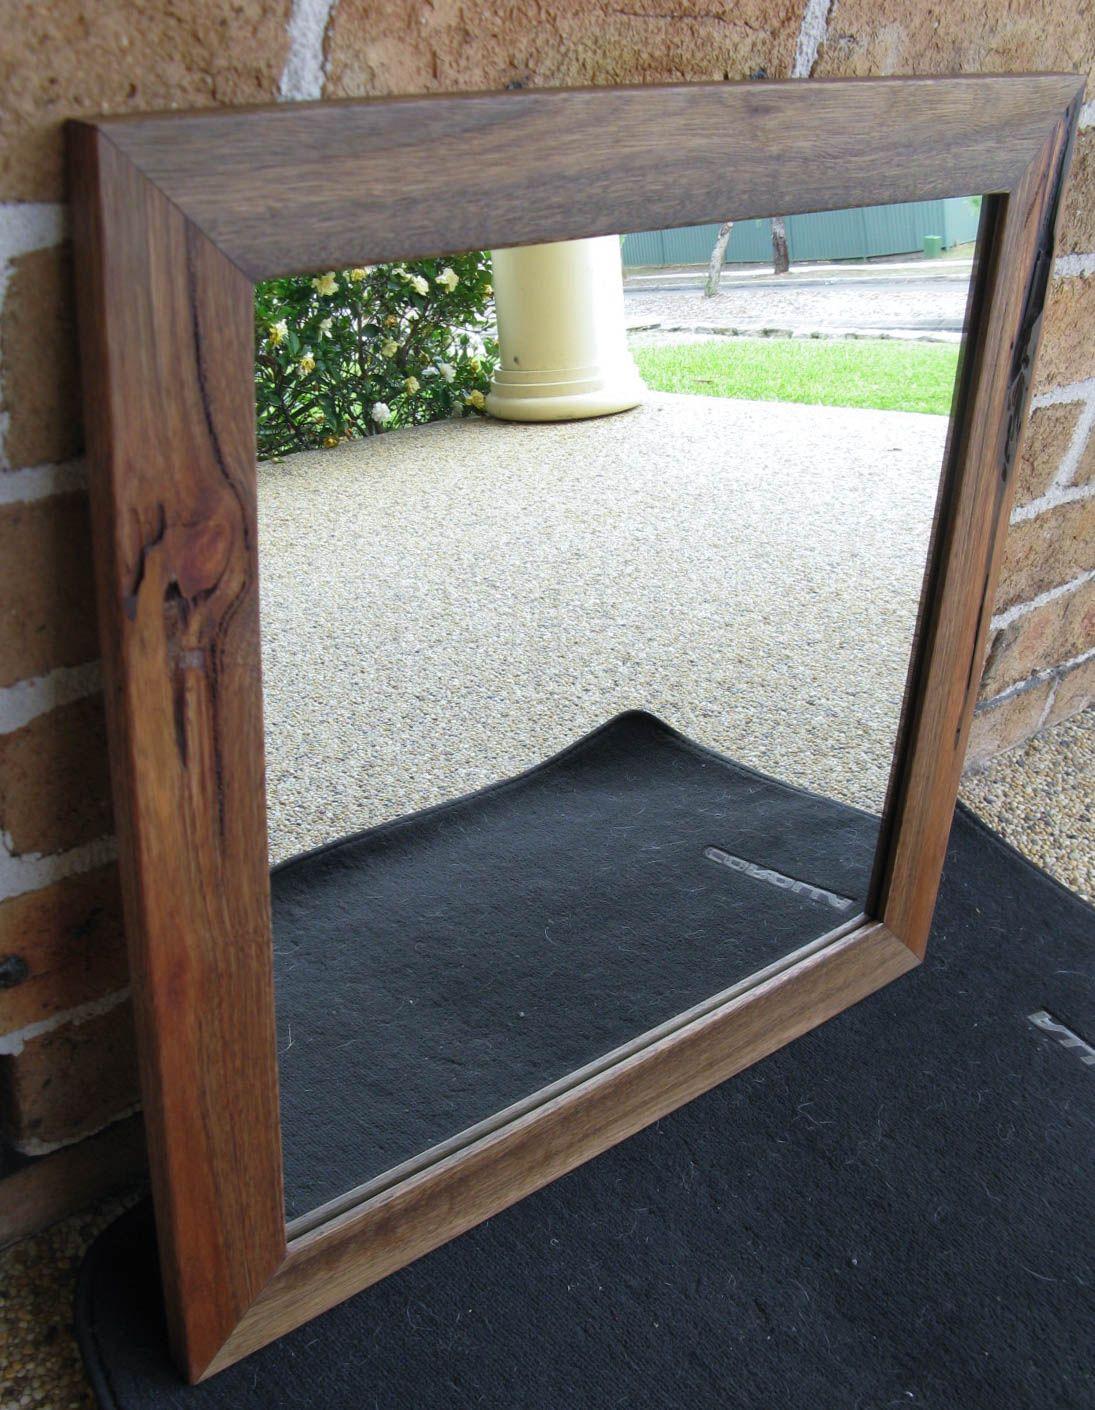 Australian Hardwood Spotted Gum Framed Wall Mirror